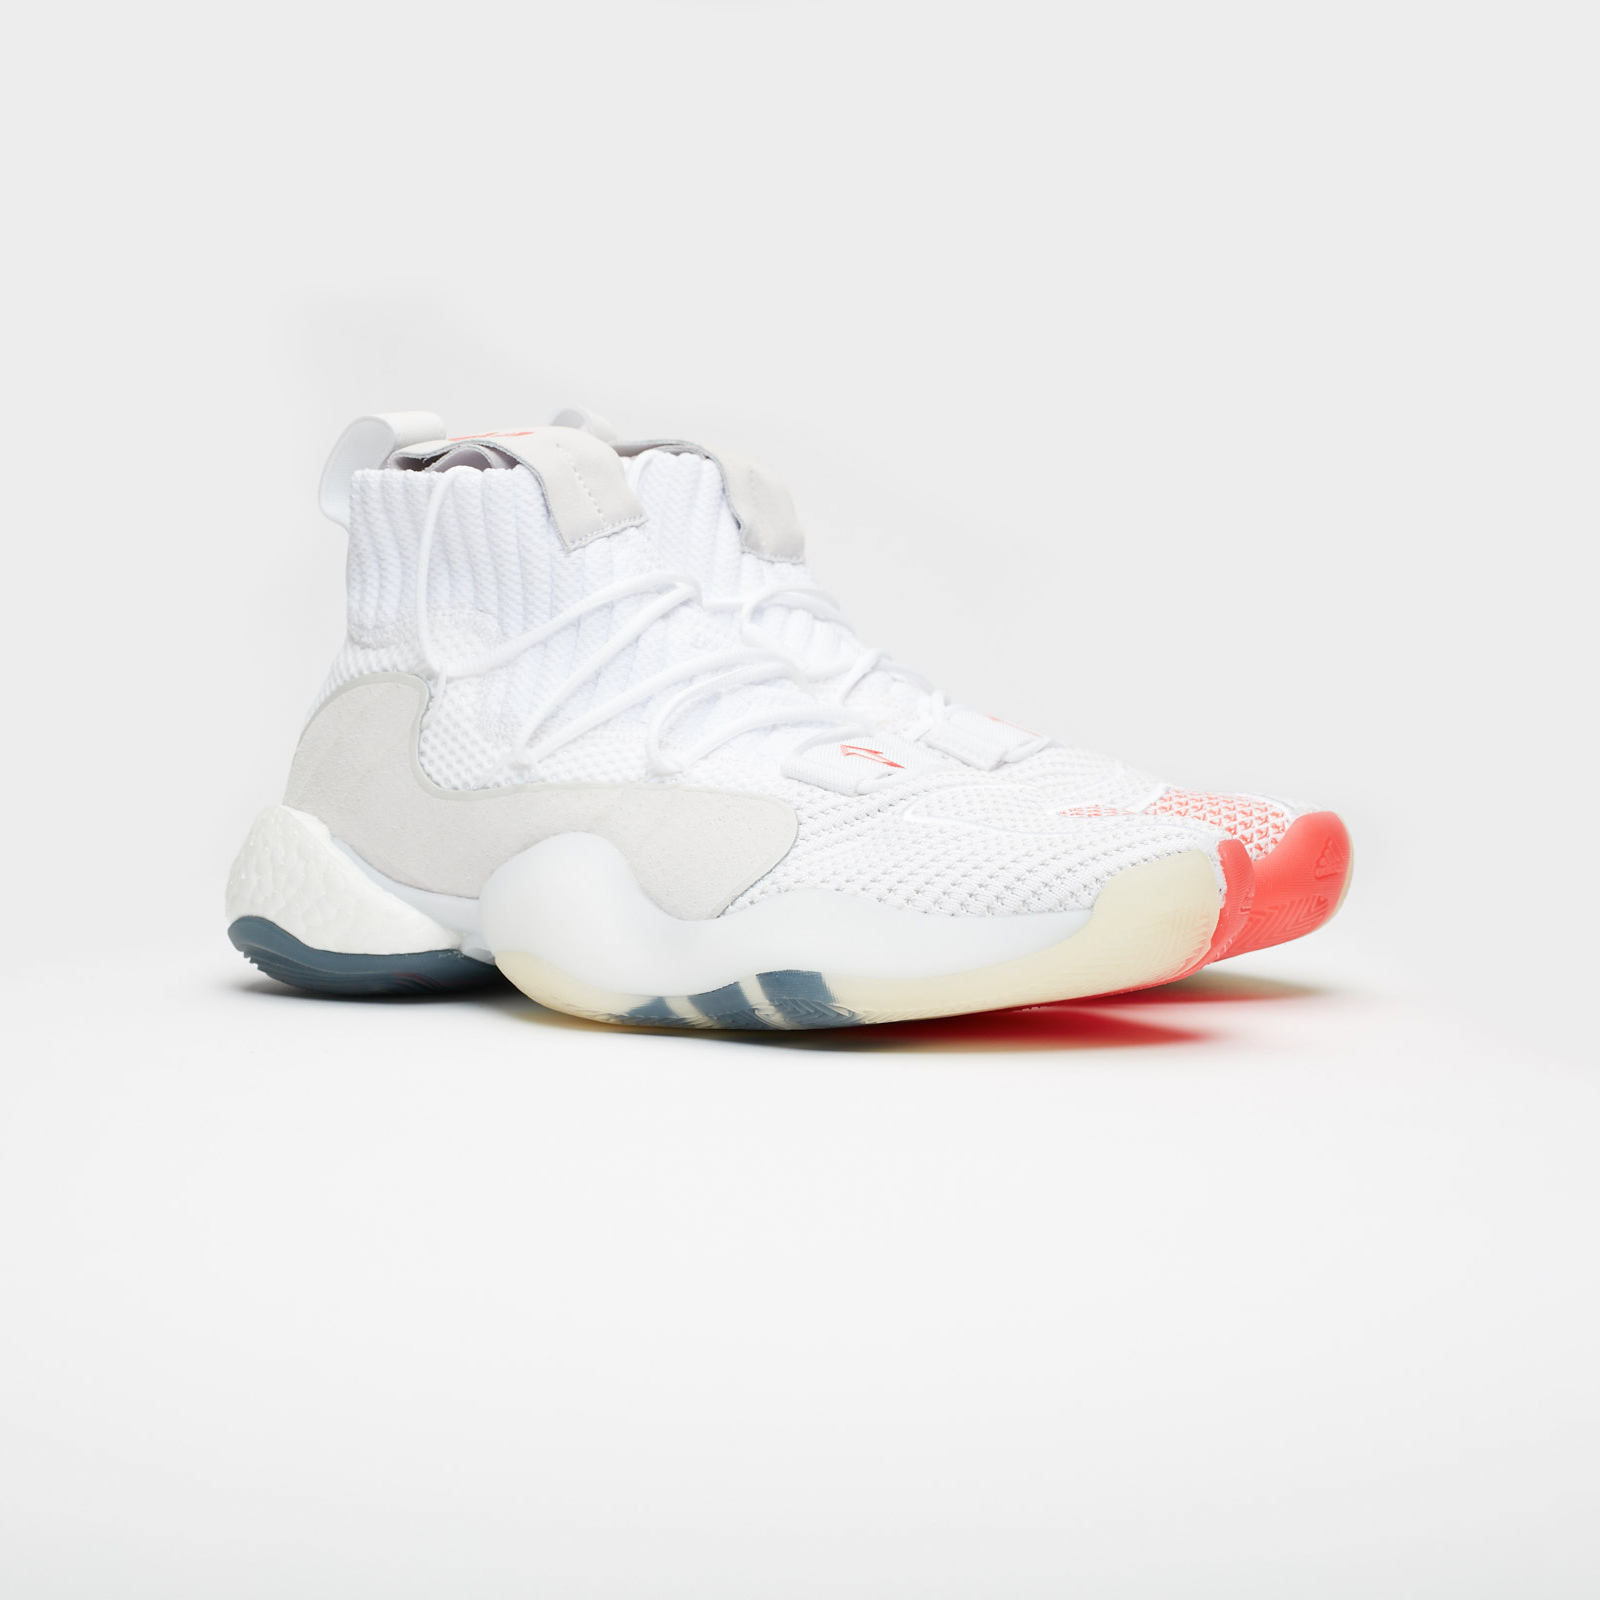 84868653026e adidas Crazy BYW Pro - B42246 - Sneakersnstuff